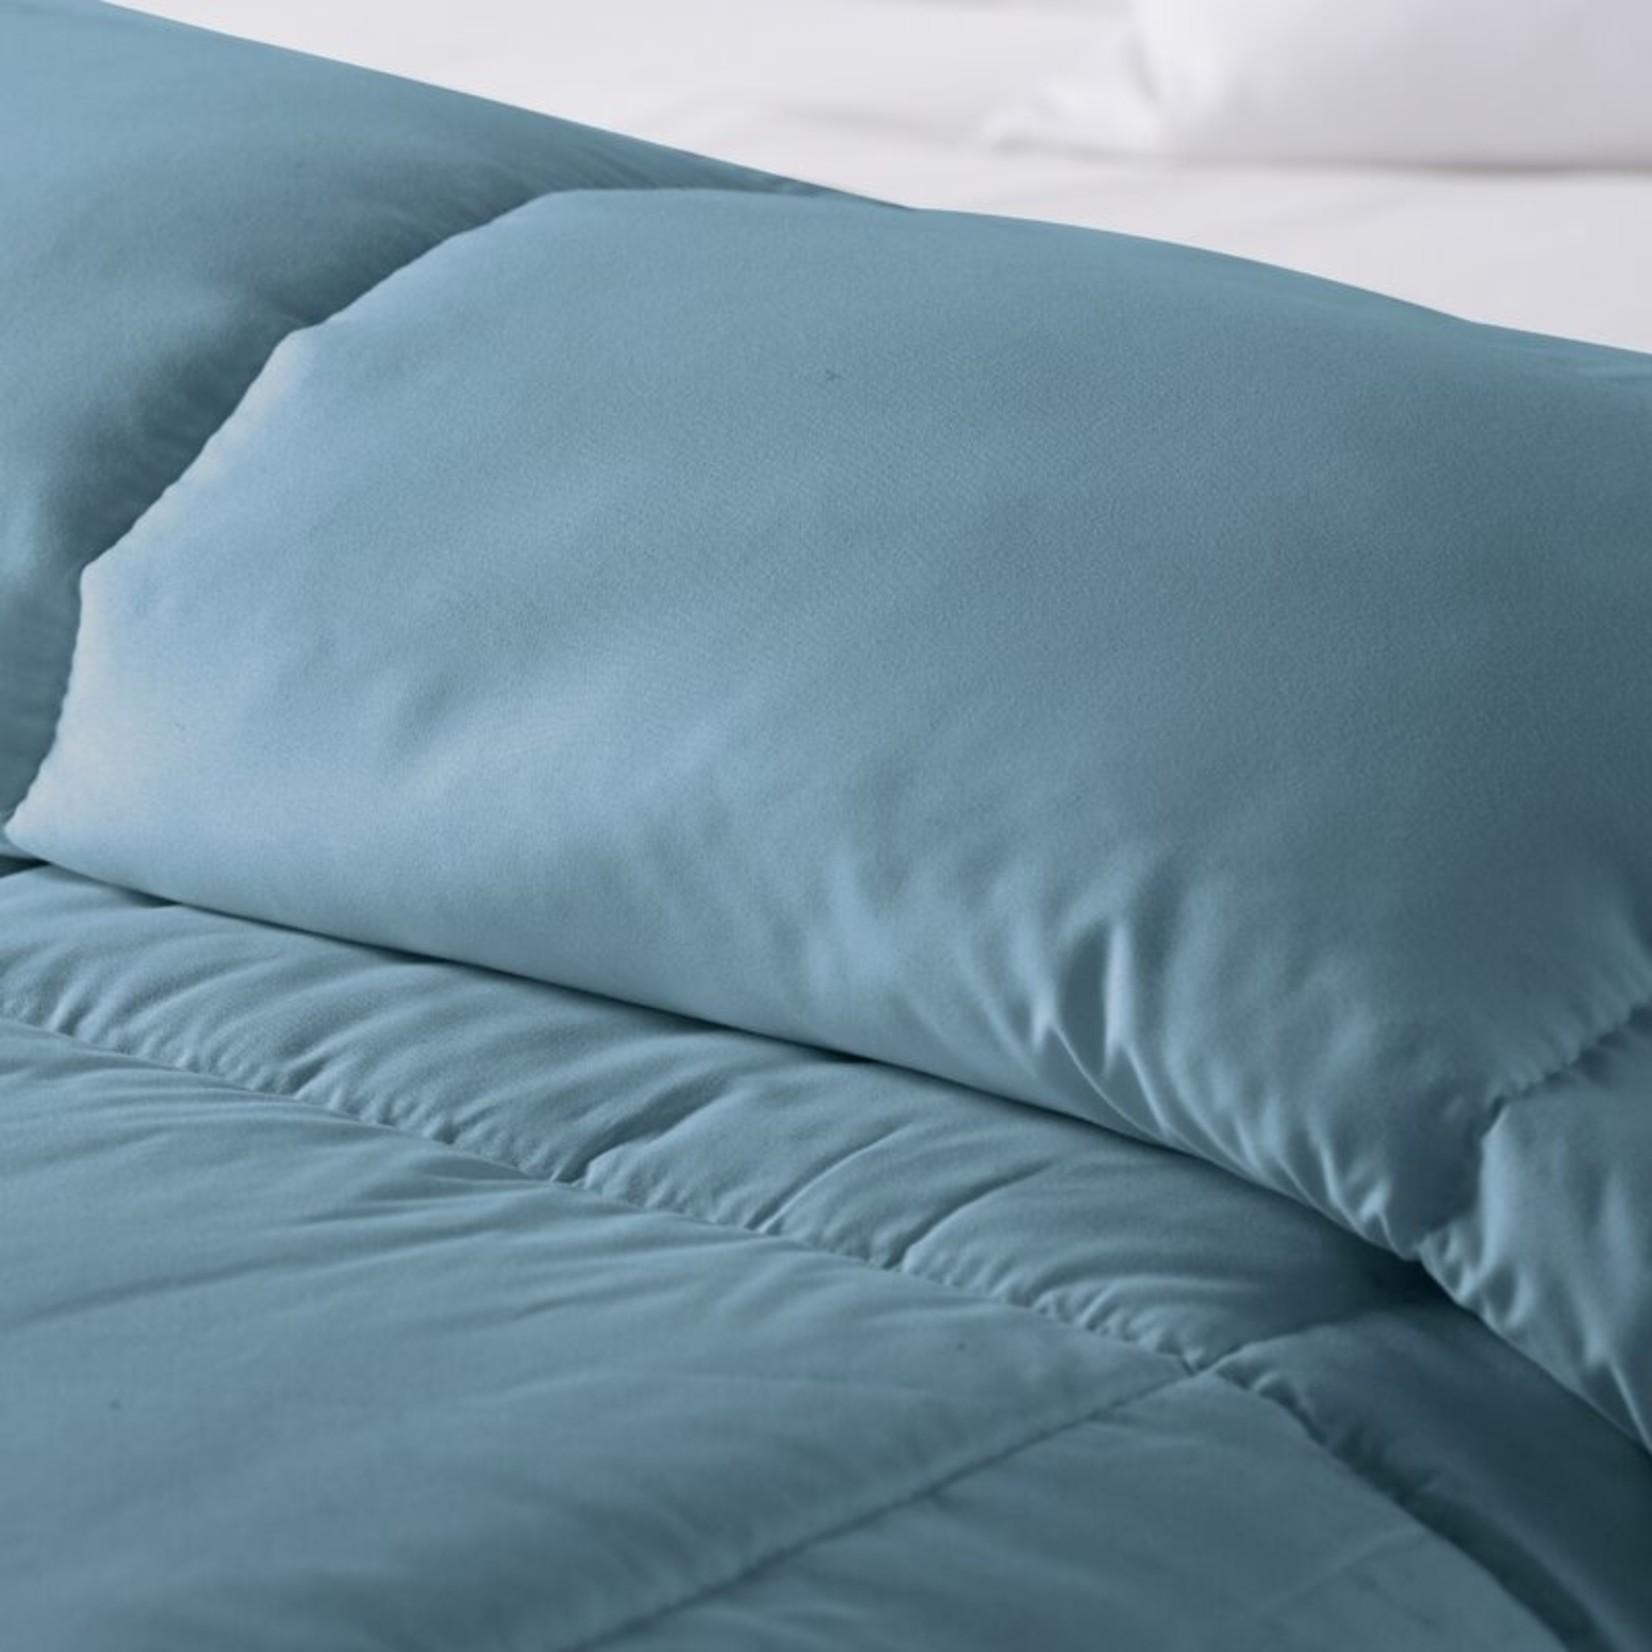 *King - Wayfair Basics All Season Down Alternative Comforter - Blue Dusk- Final Sale